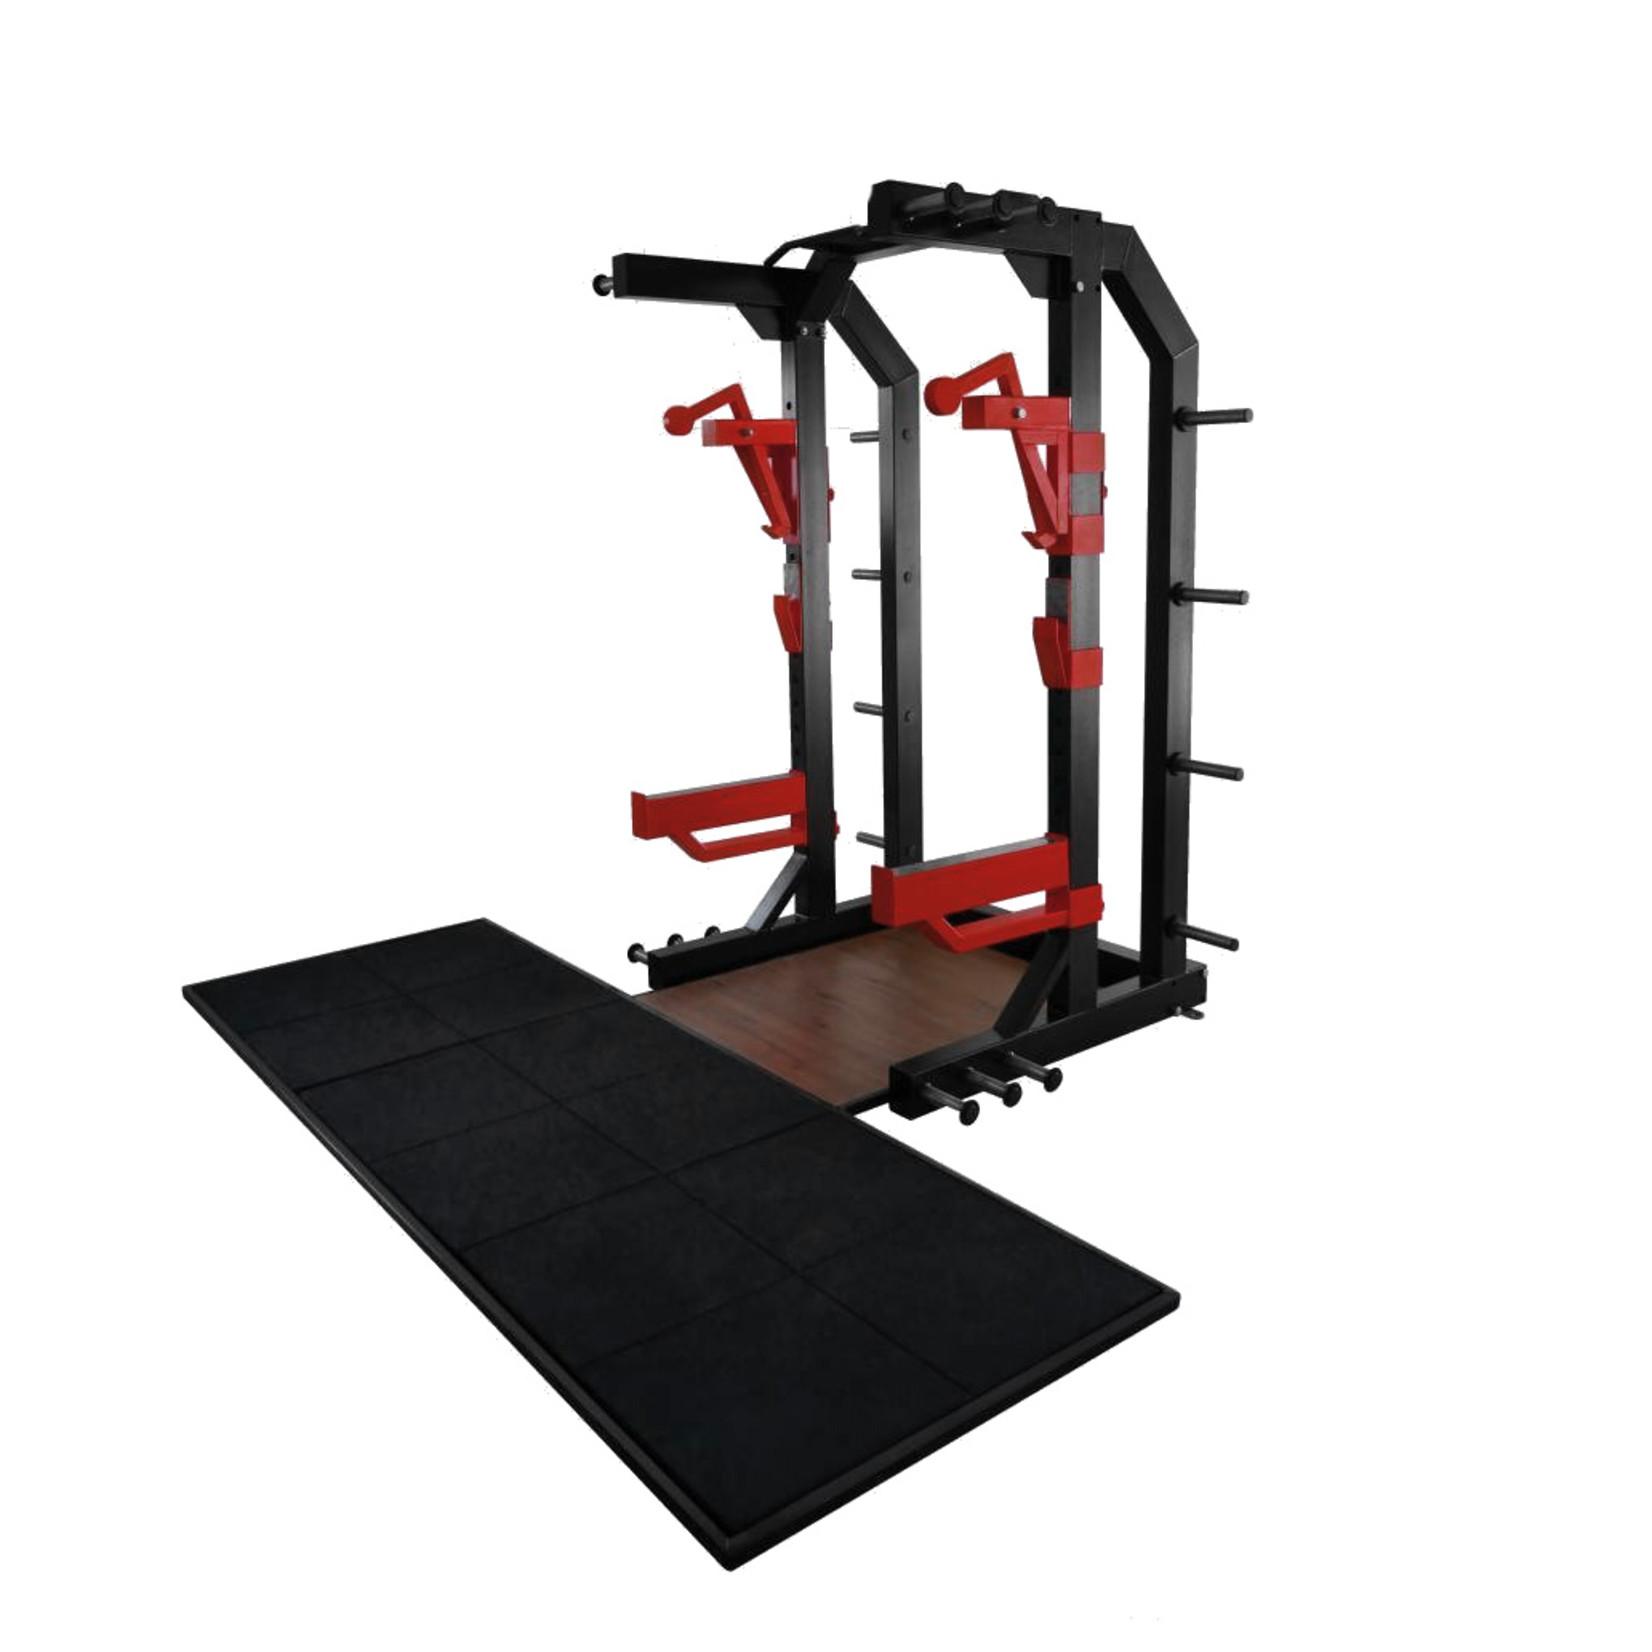 Half Rack with Weight Lifting Platform